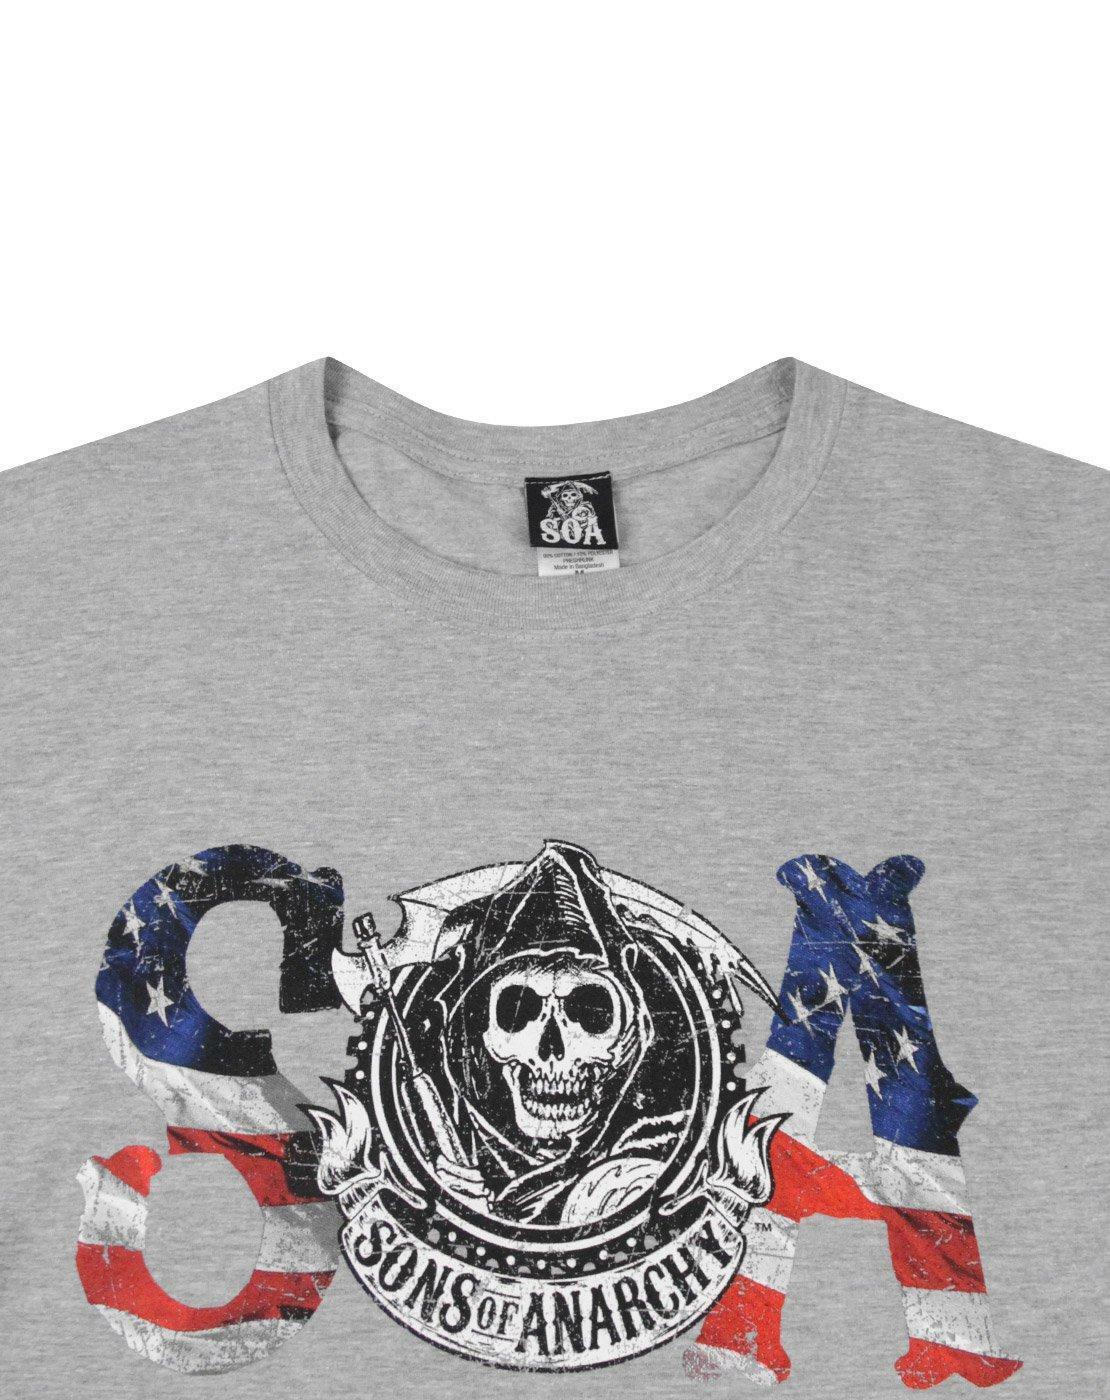 Sons-Of-Anarchy-Flag-Men-039-s-T-Shirt miniatuur 8